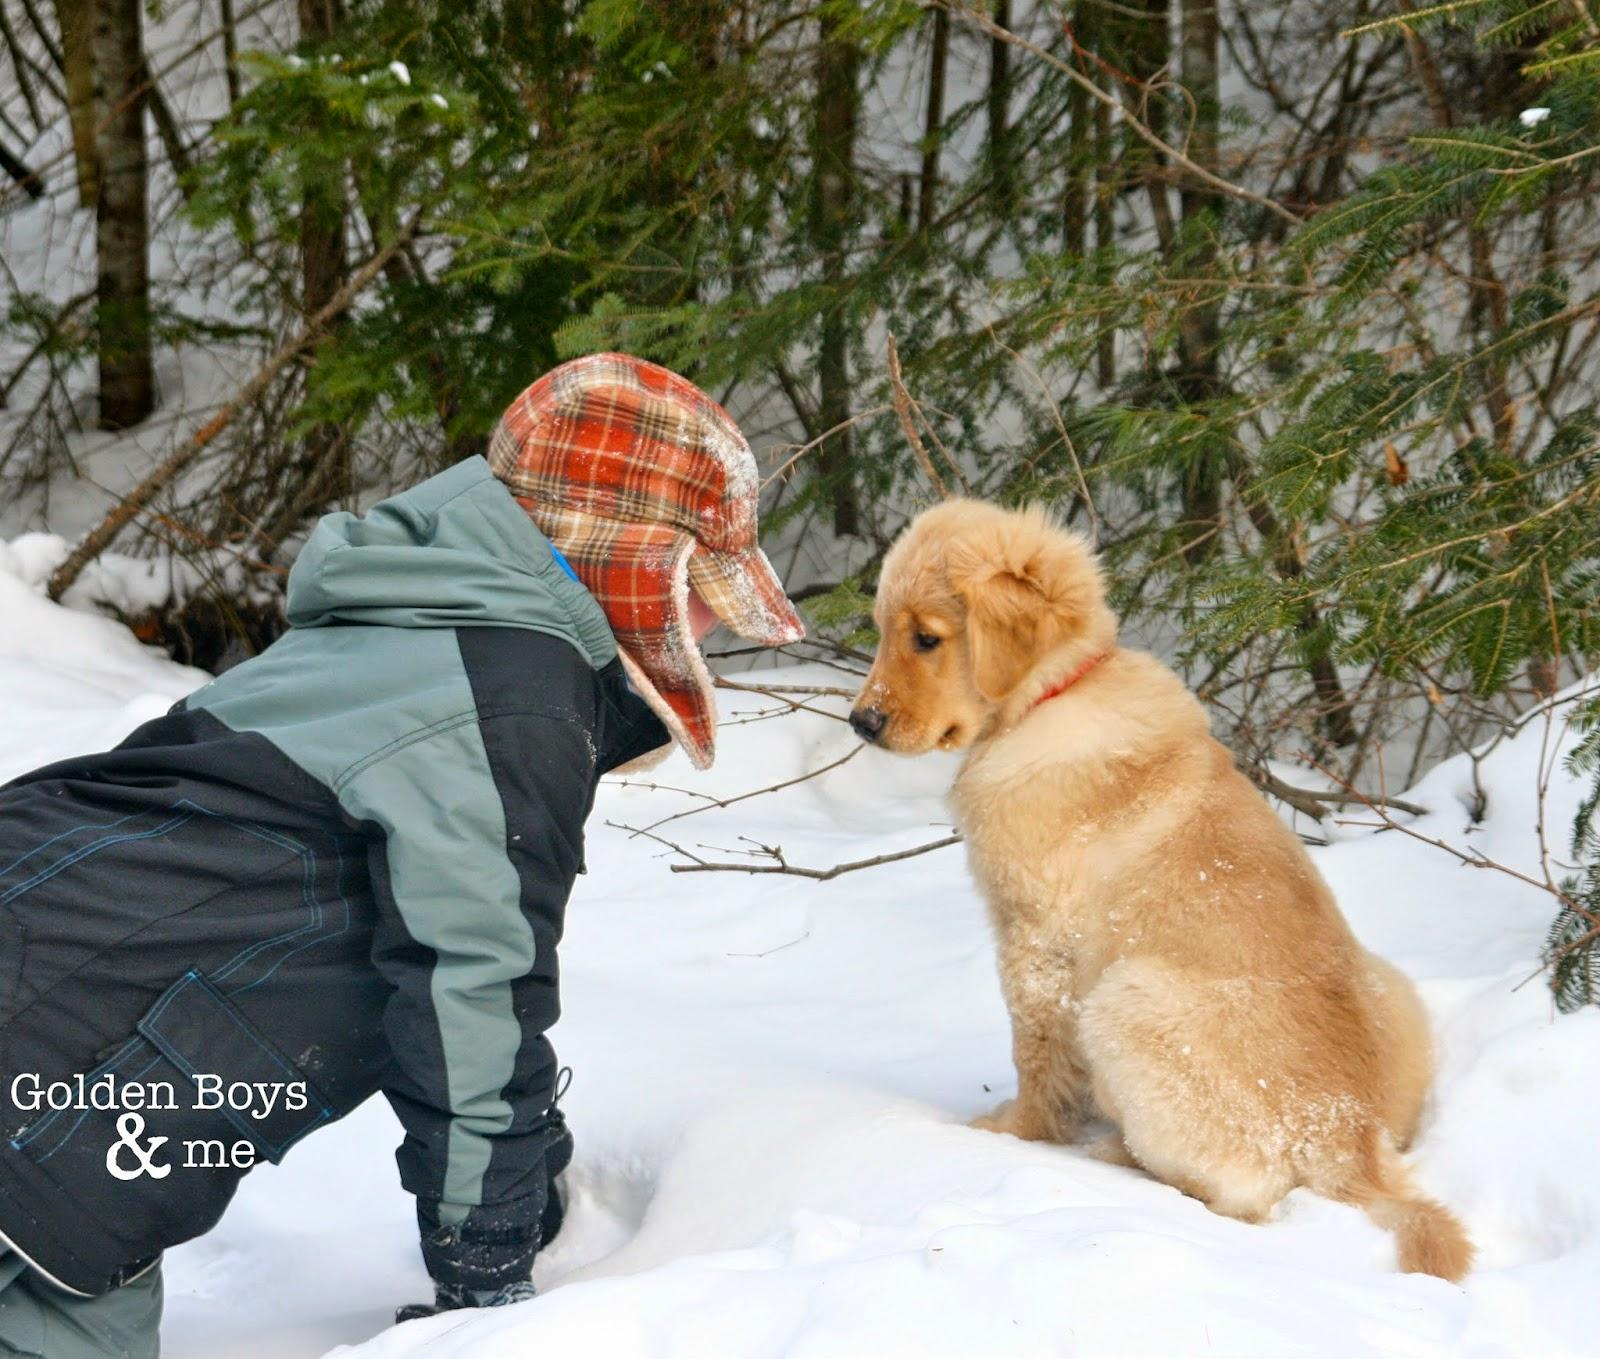 Golden Retriever puppy in snow with boy-www.goldenboysandme.com